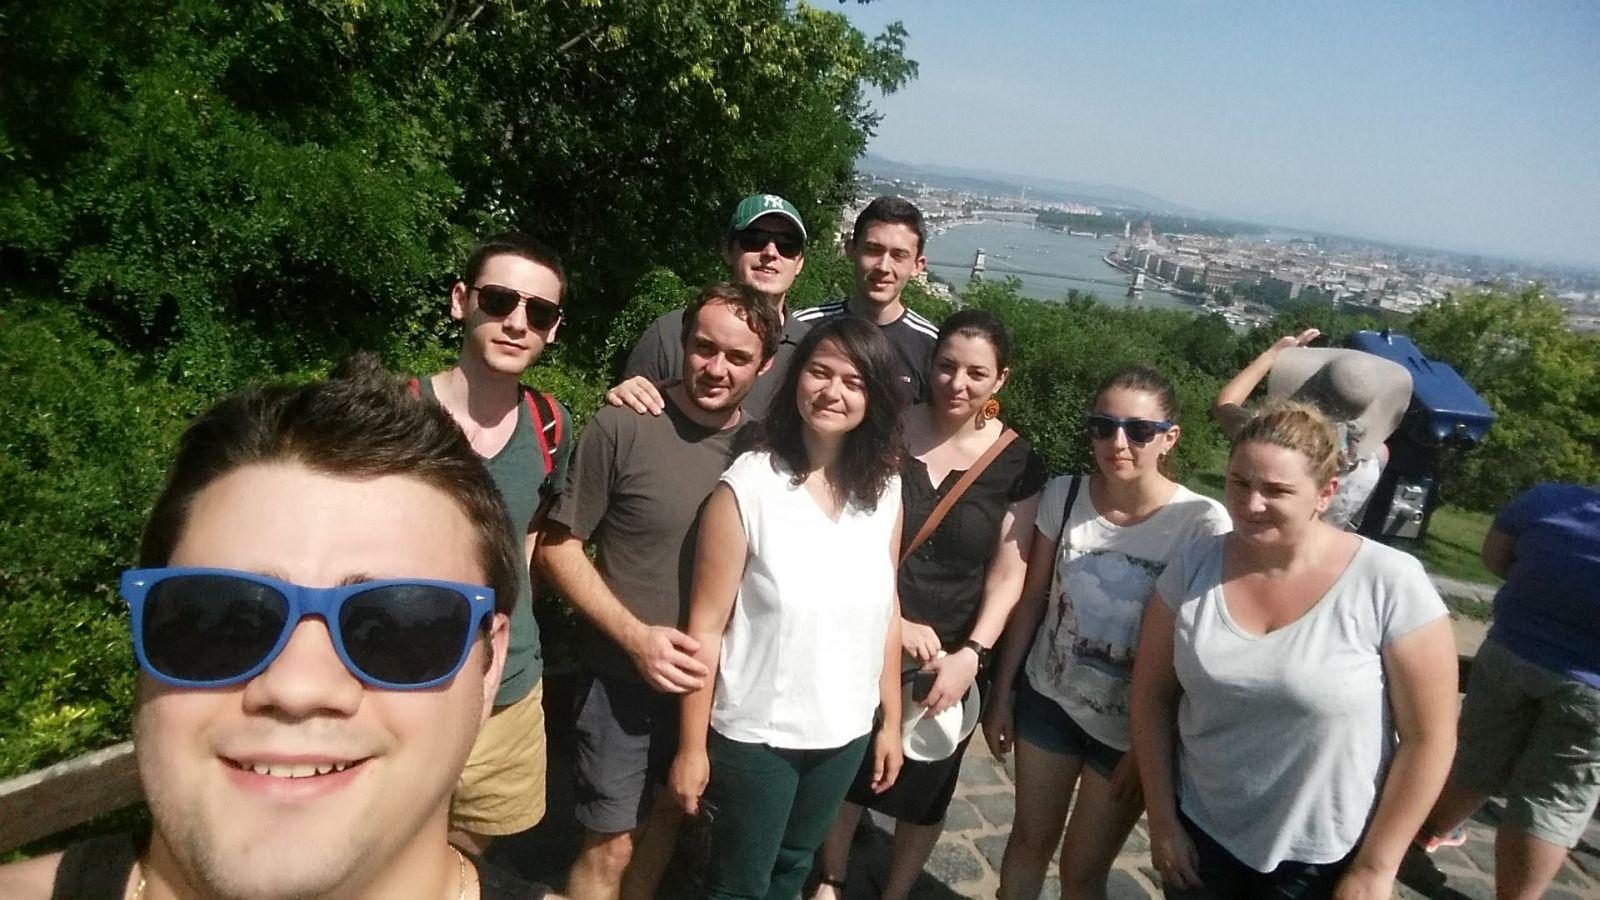 CobaltSign-Budapest-Team Building-Selfie